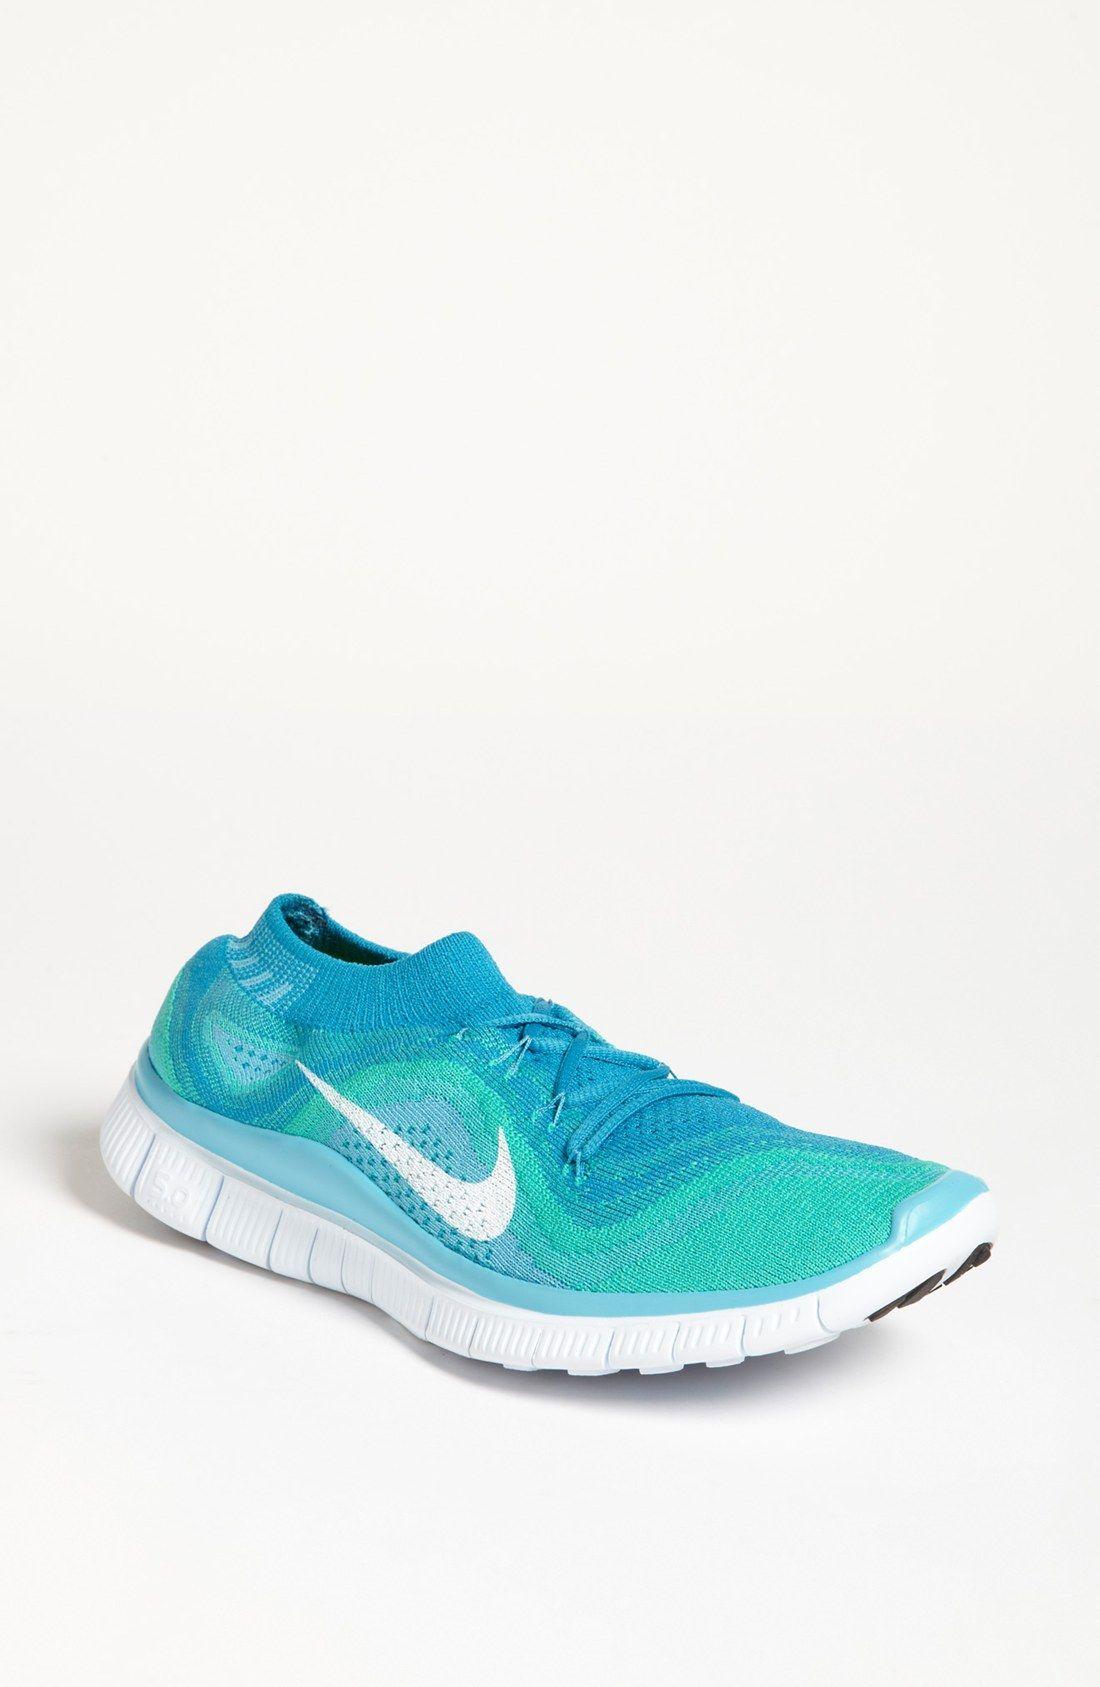 brand new c48c8 3fd9e Nike  Free Flyknit  Running Shoe (Women)   Nordstrom